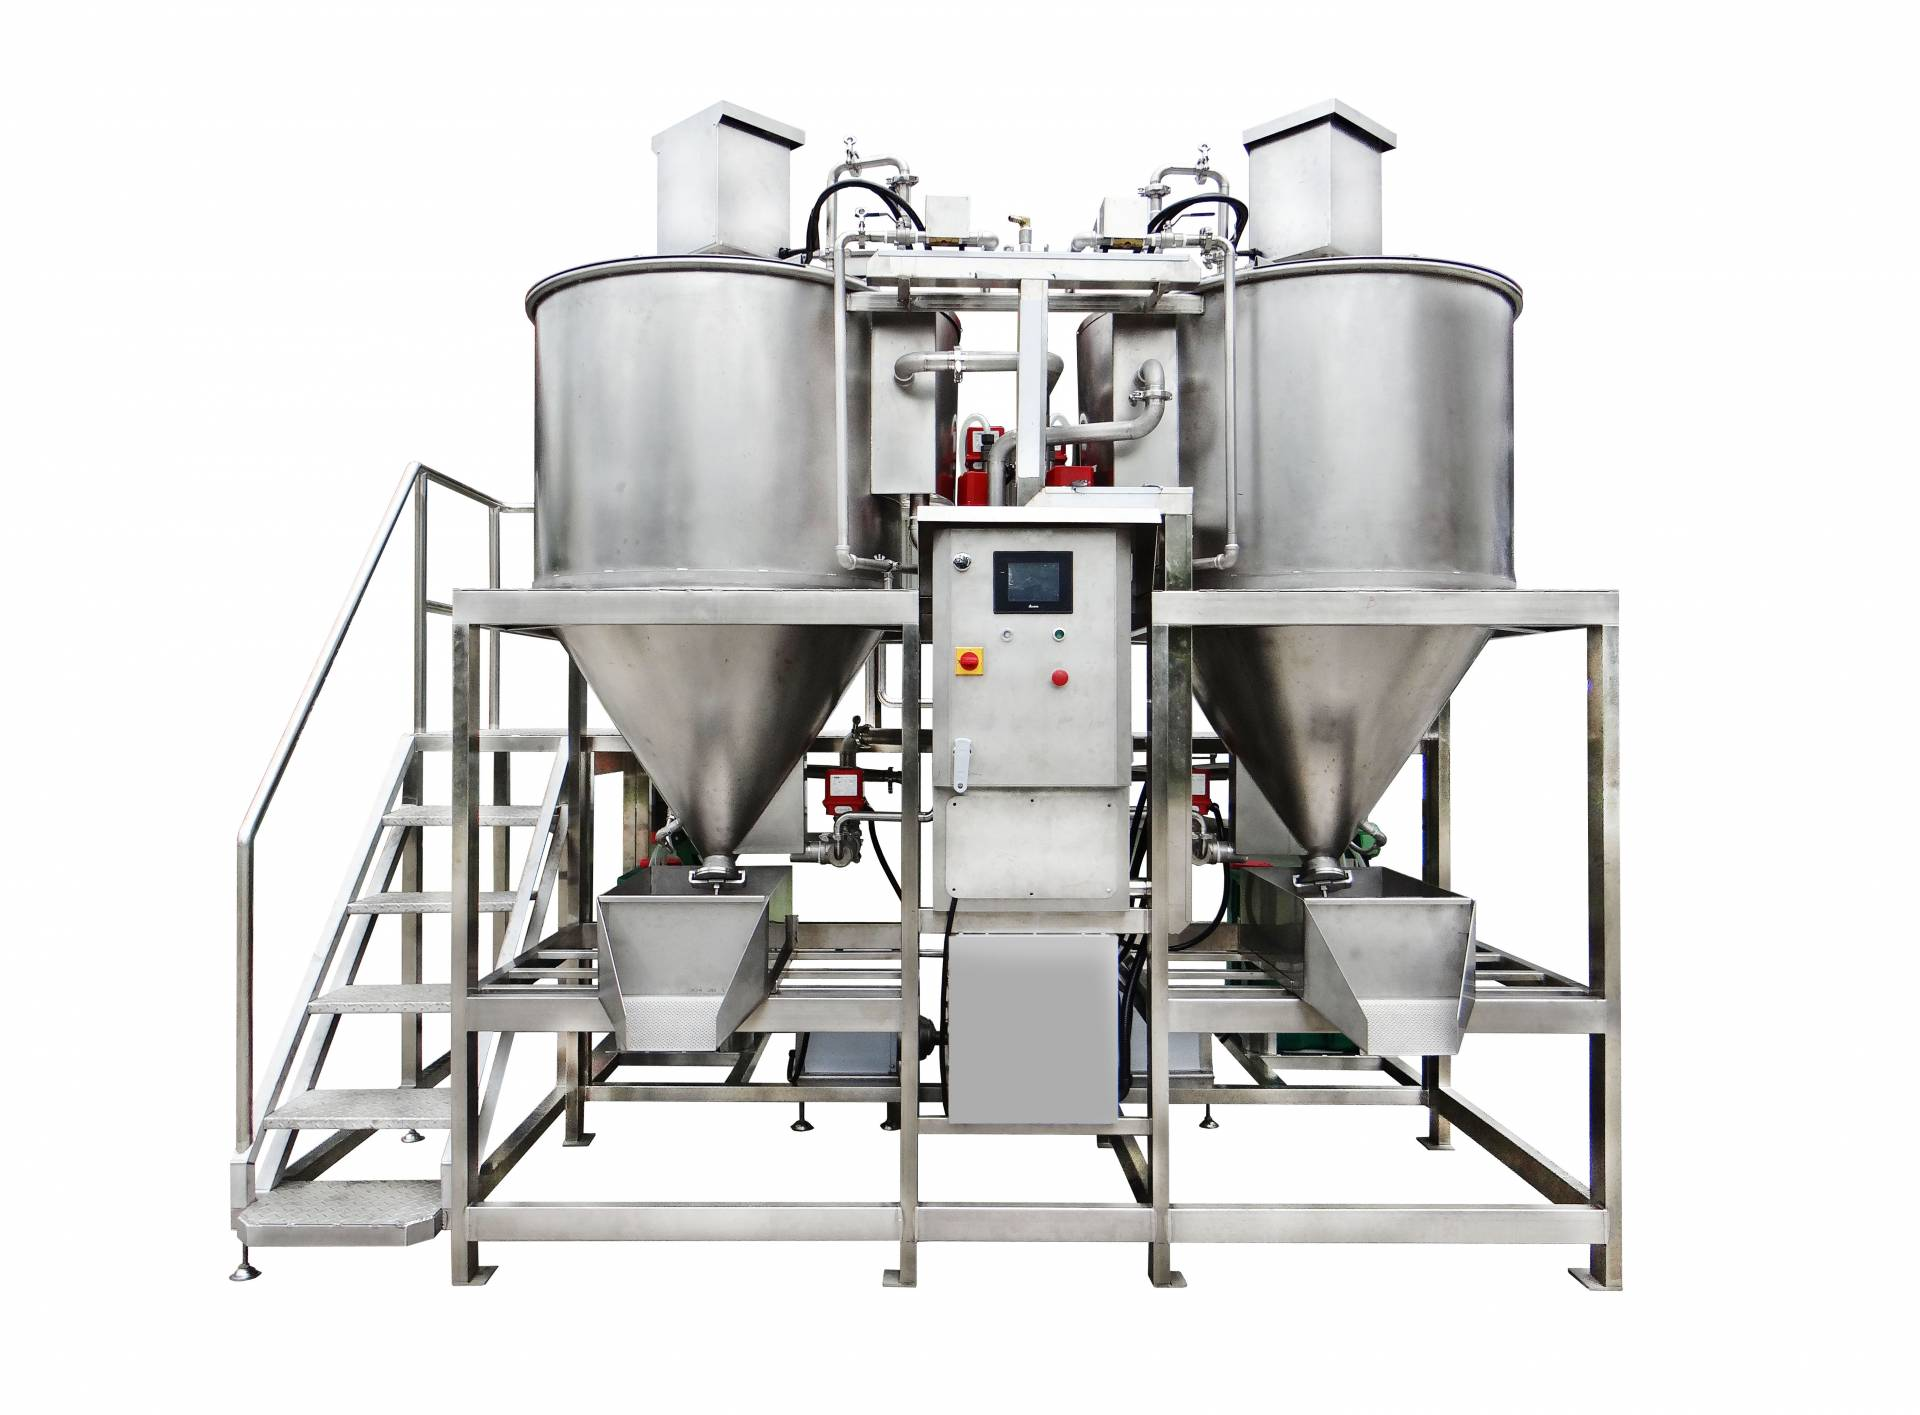 Bean Washing and Sterilizing System - Bean Washing and Sterilizing Machine